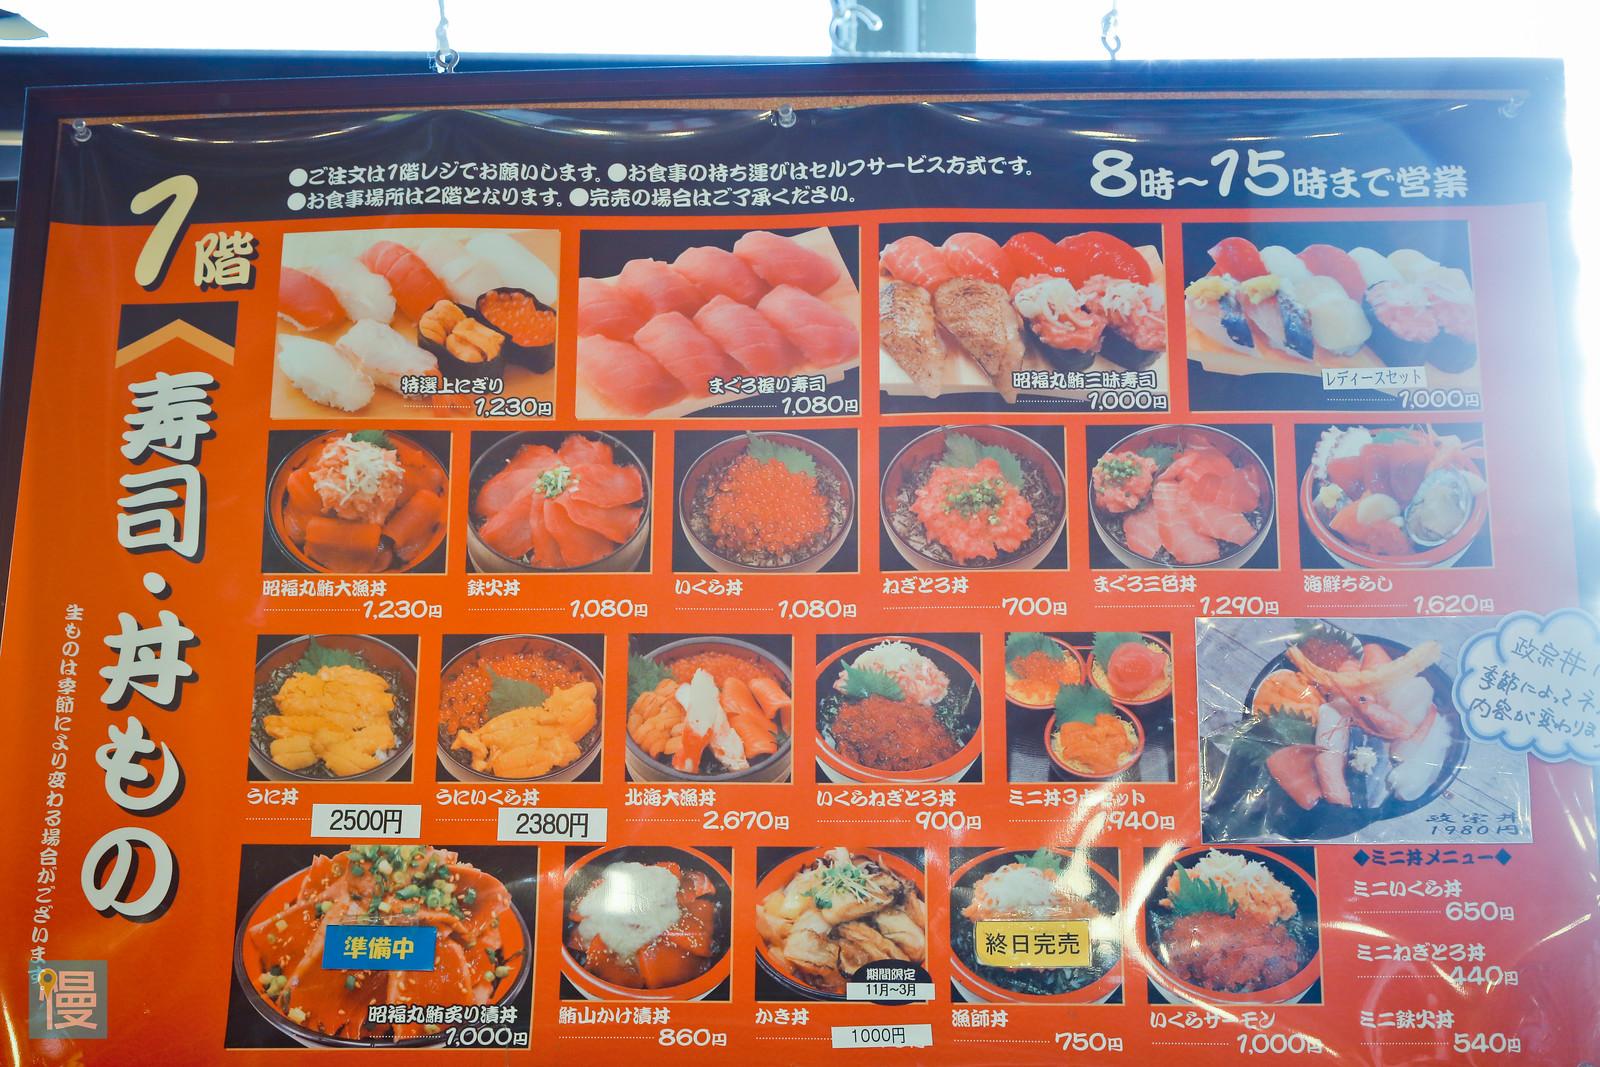 Tohoku 松島美食 - 458